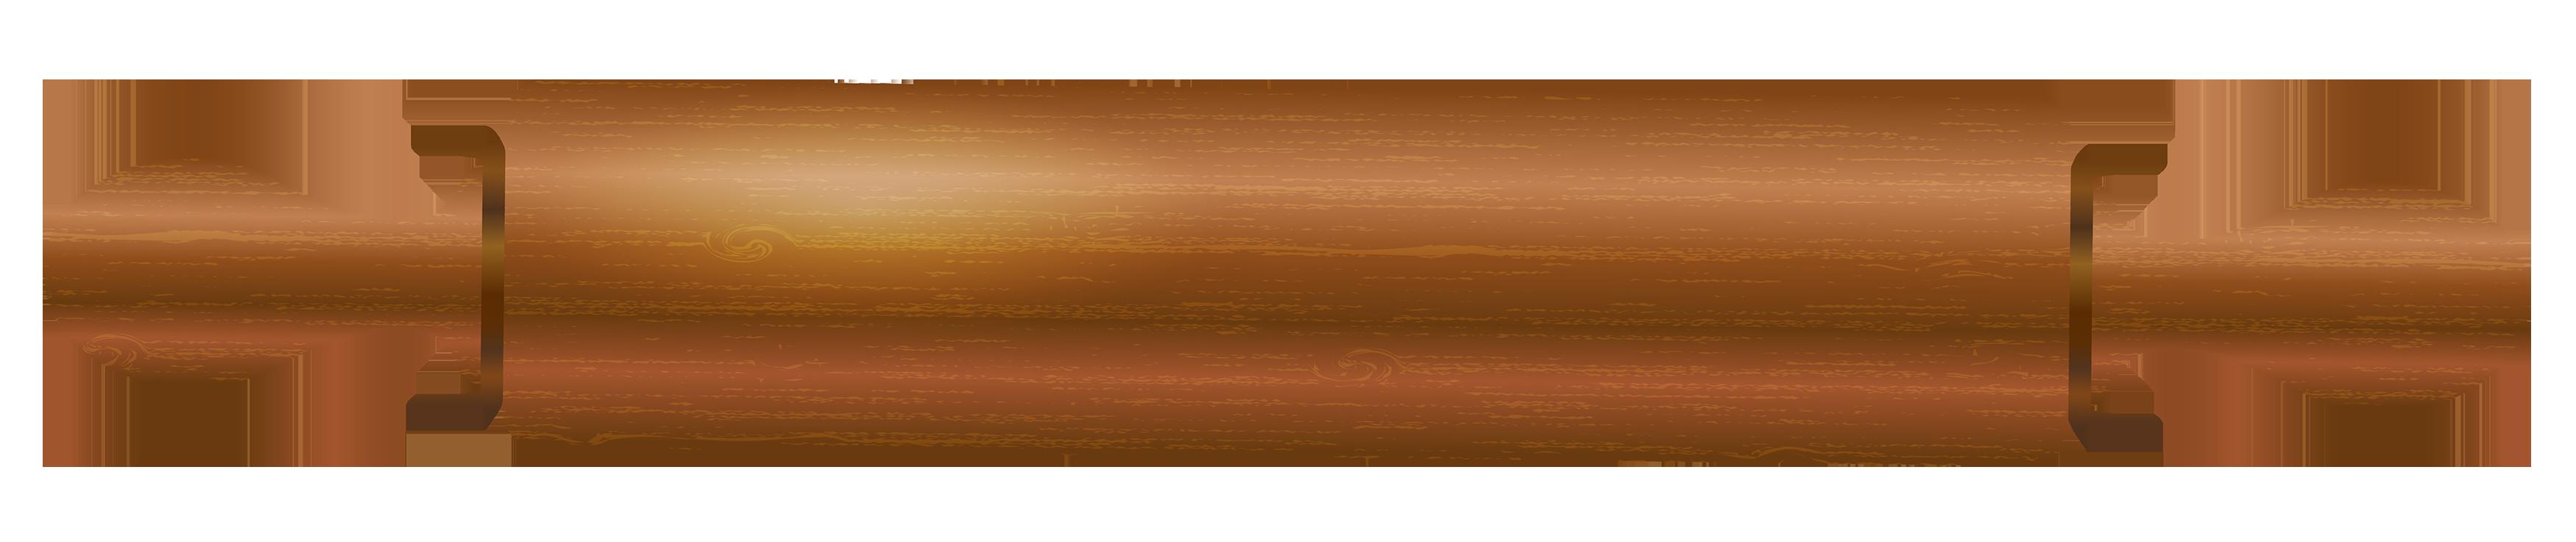 Wooden car clipart jpg stock Wooden Rolling Pin PNG Clipart - Best WEB Clipart jpg stock